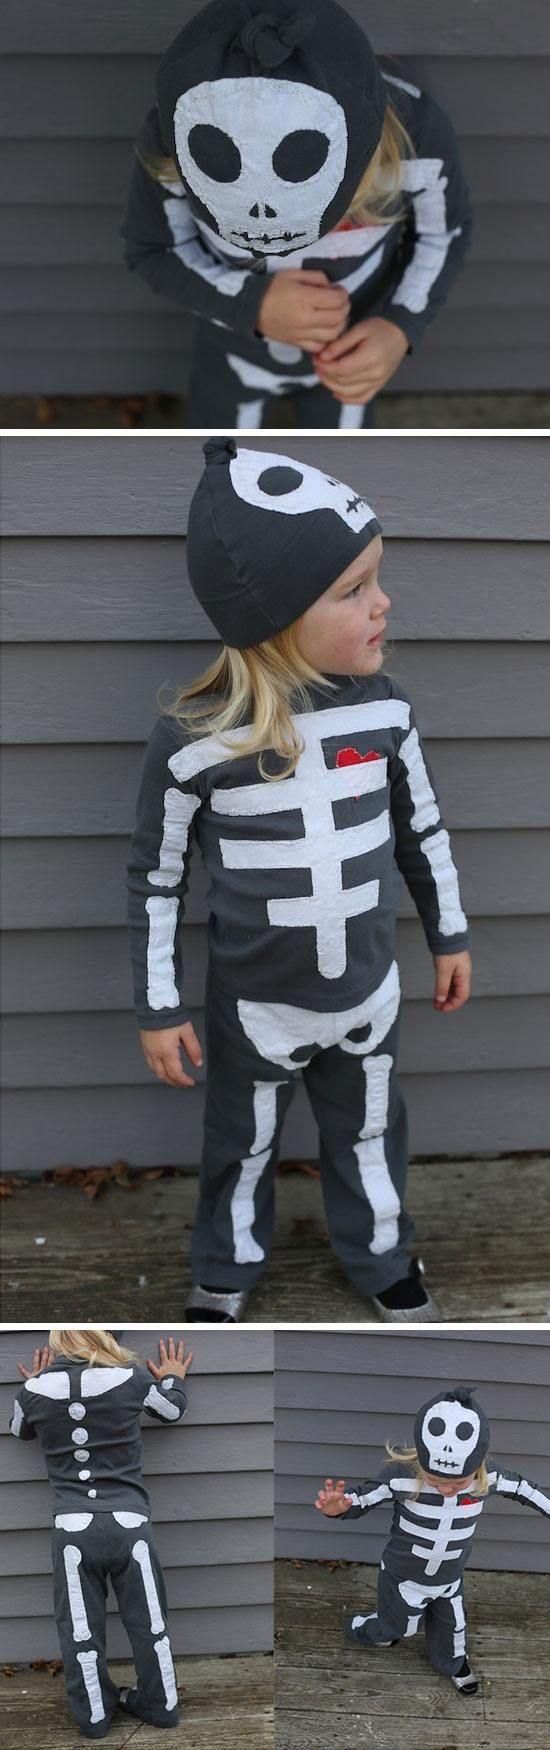 Skeleton Costume   Click for 30 DIY Halloween Costumes for Kids to Make   DIY Halloween Costumes for Toddlers